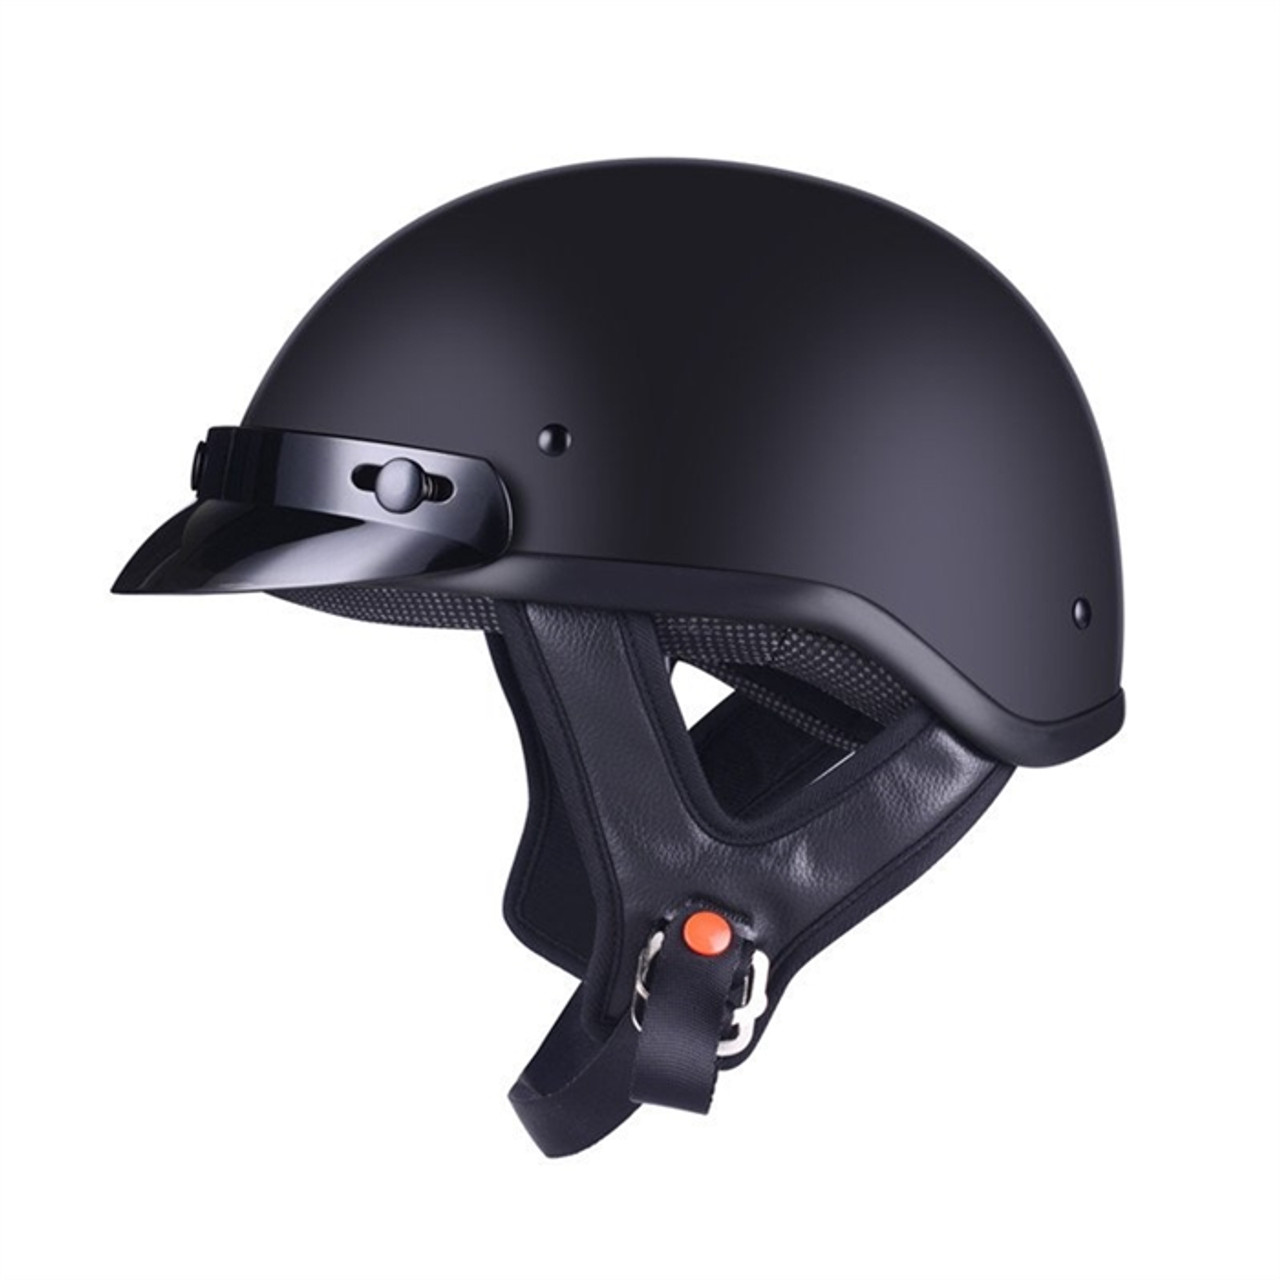 AMZ CRUISING HALF FACE MOTORCYCLE MATTE BLACK  HELMET